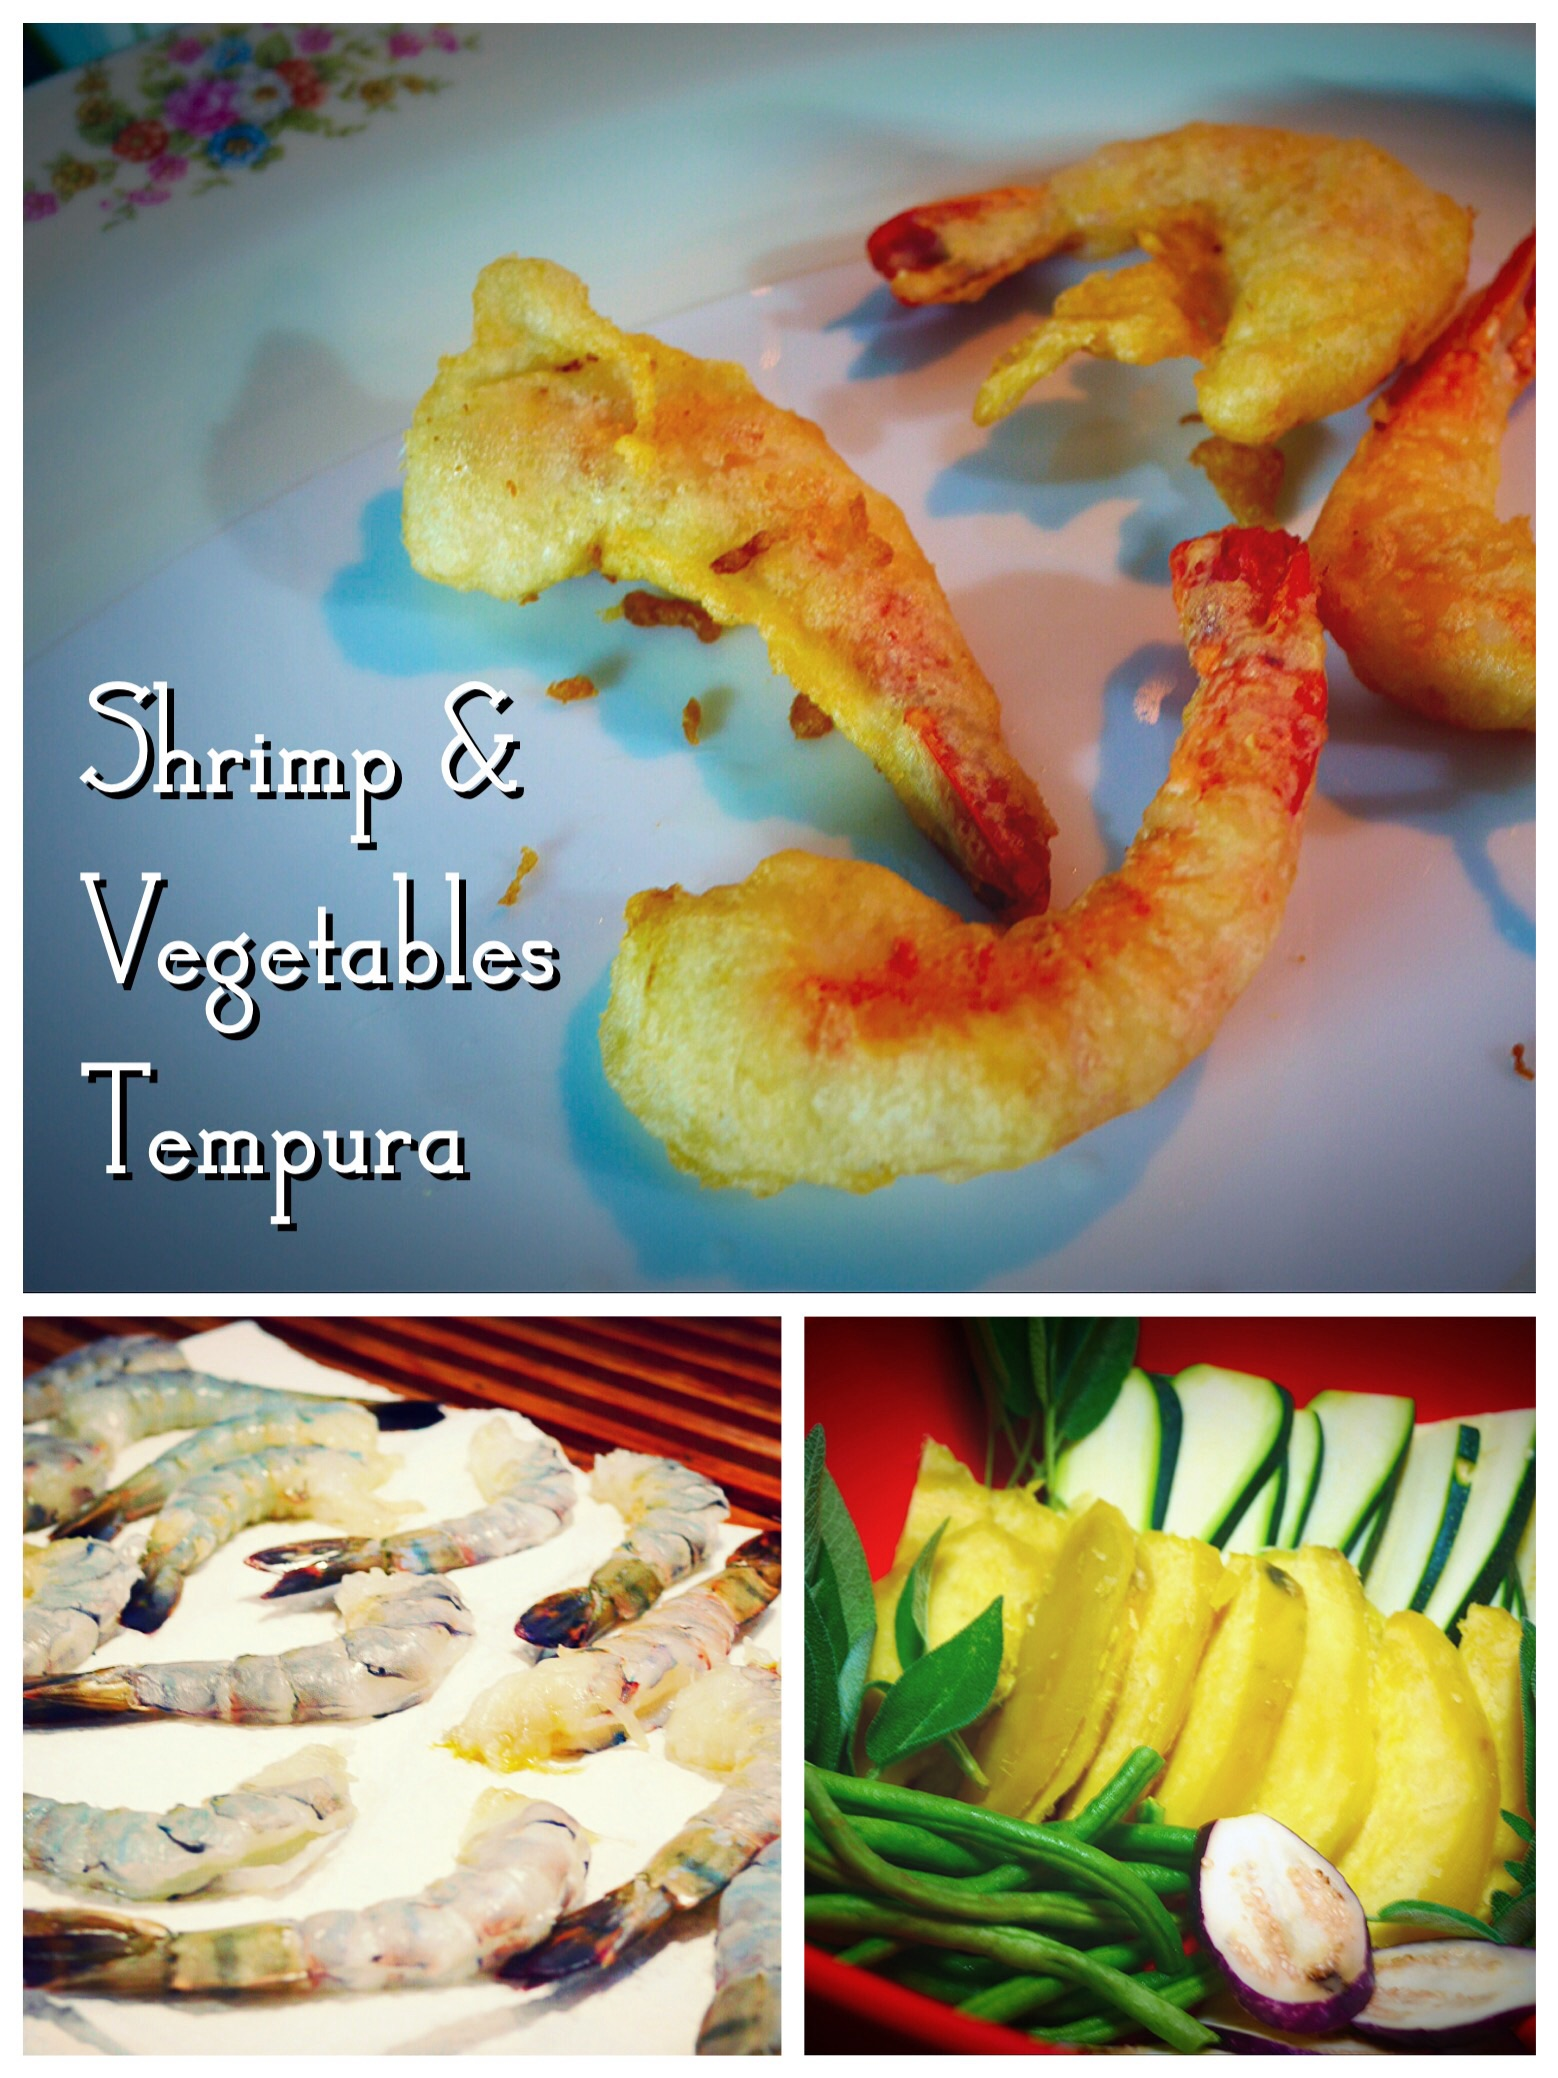 Shrimp & Vegetables Tempura